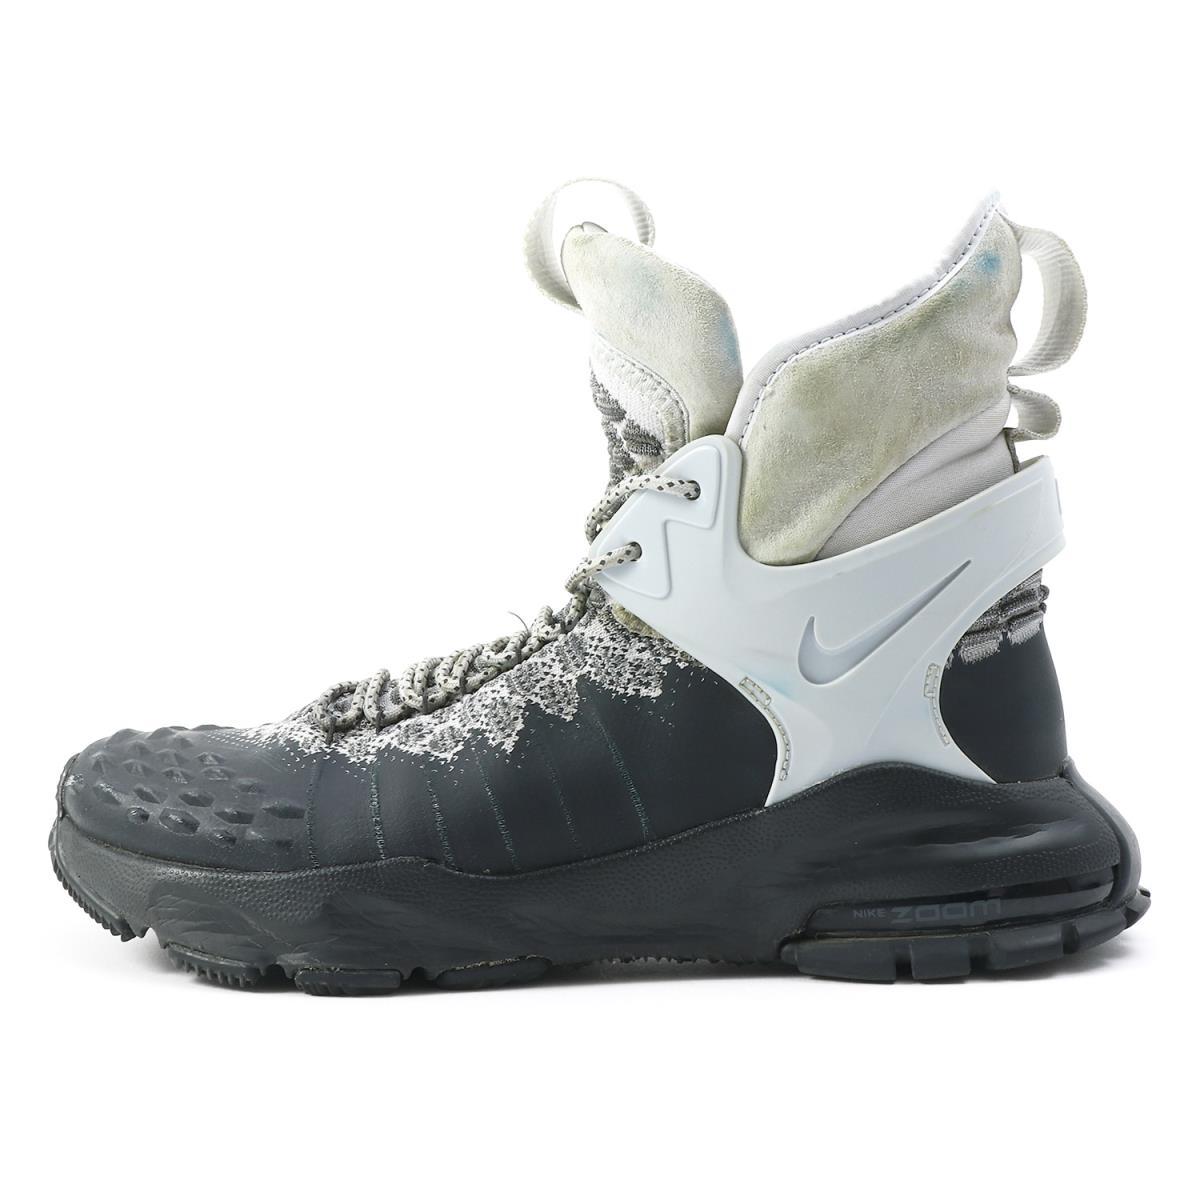 b0b4d6a468cd BEEGLE by Boo-Bee  NIKE (Nike) NikeLab ACG ZOOM TALLAC FLYKNIT ...